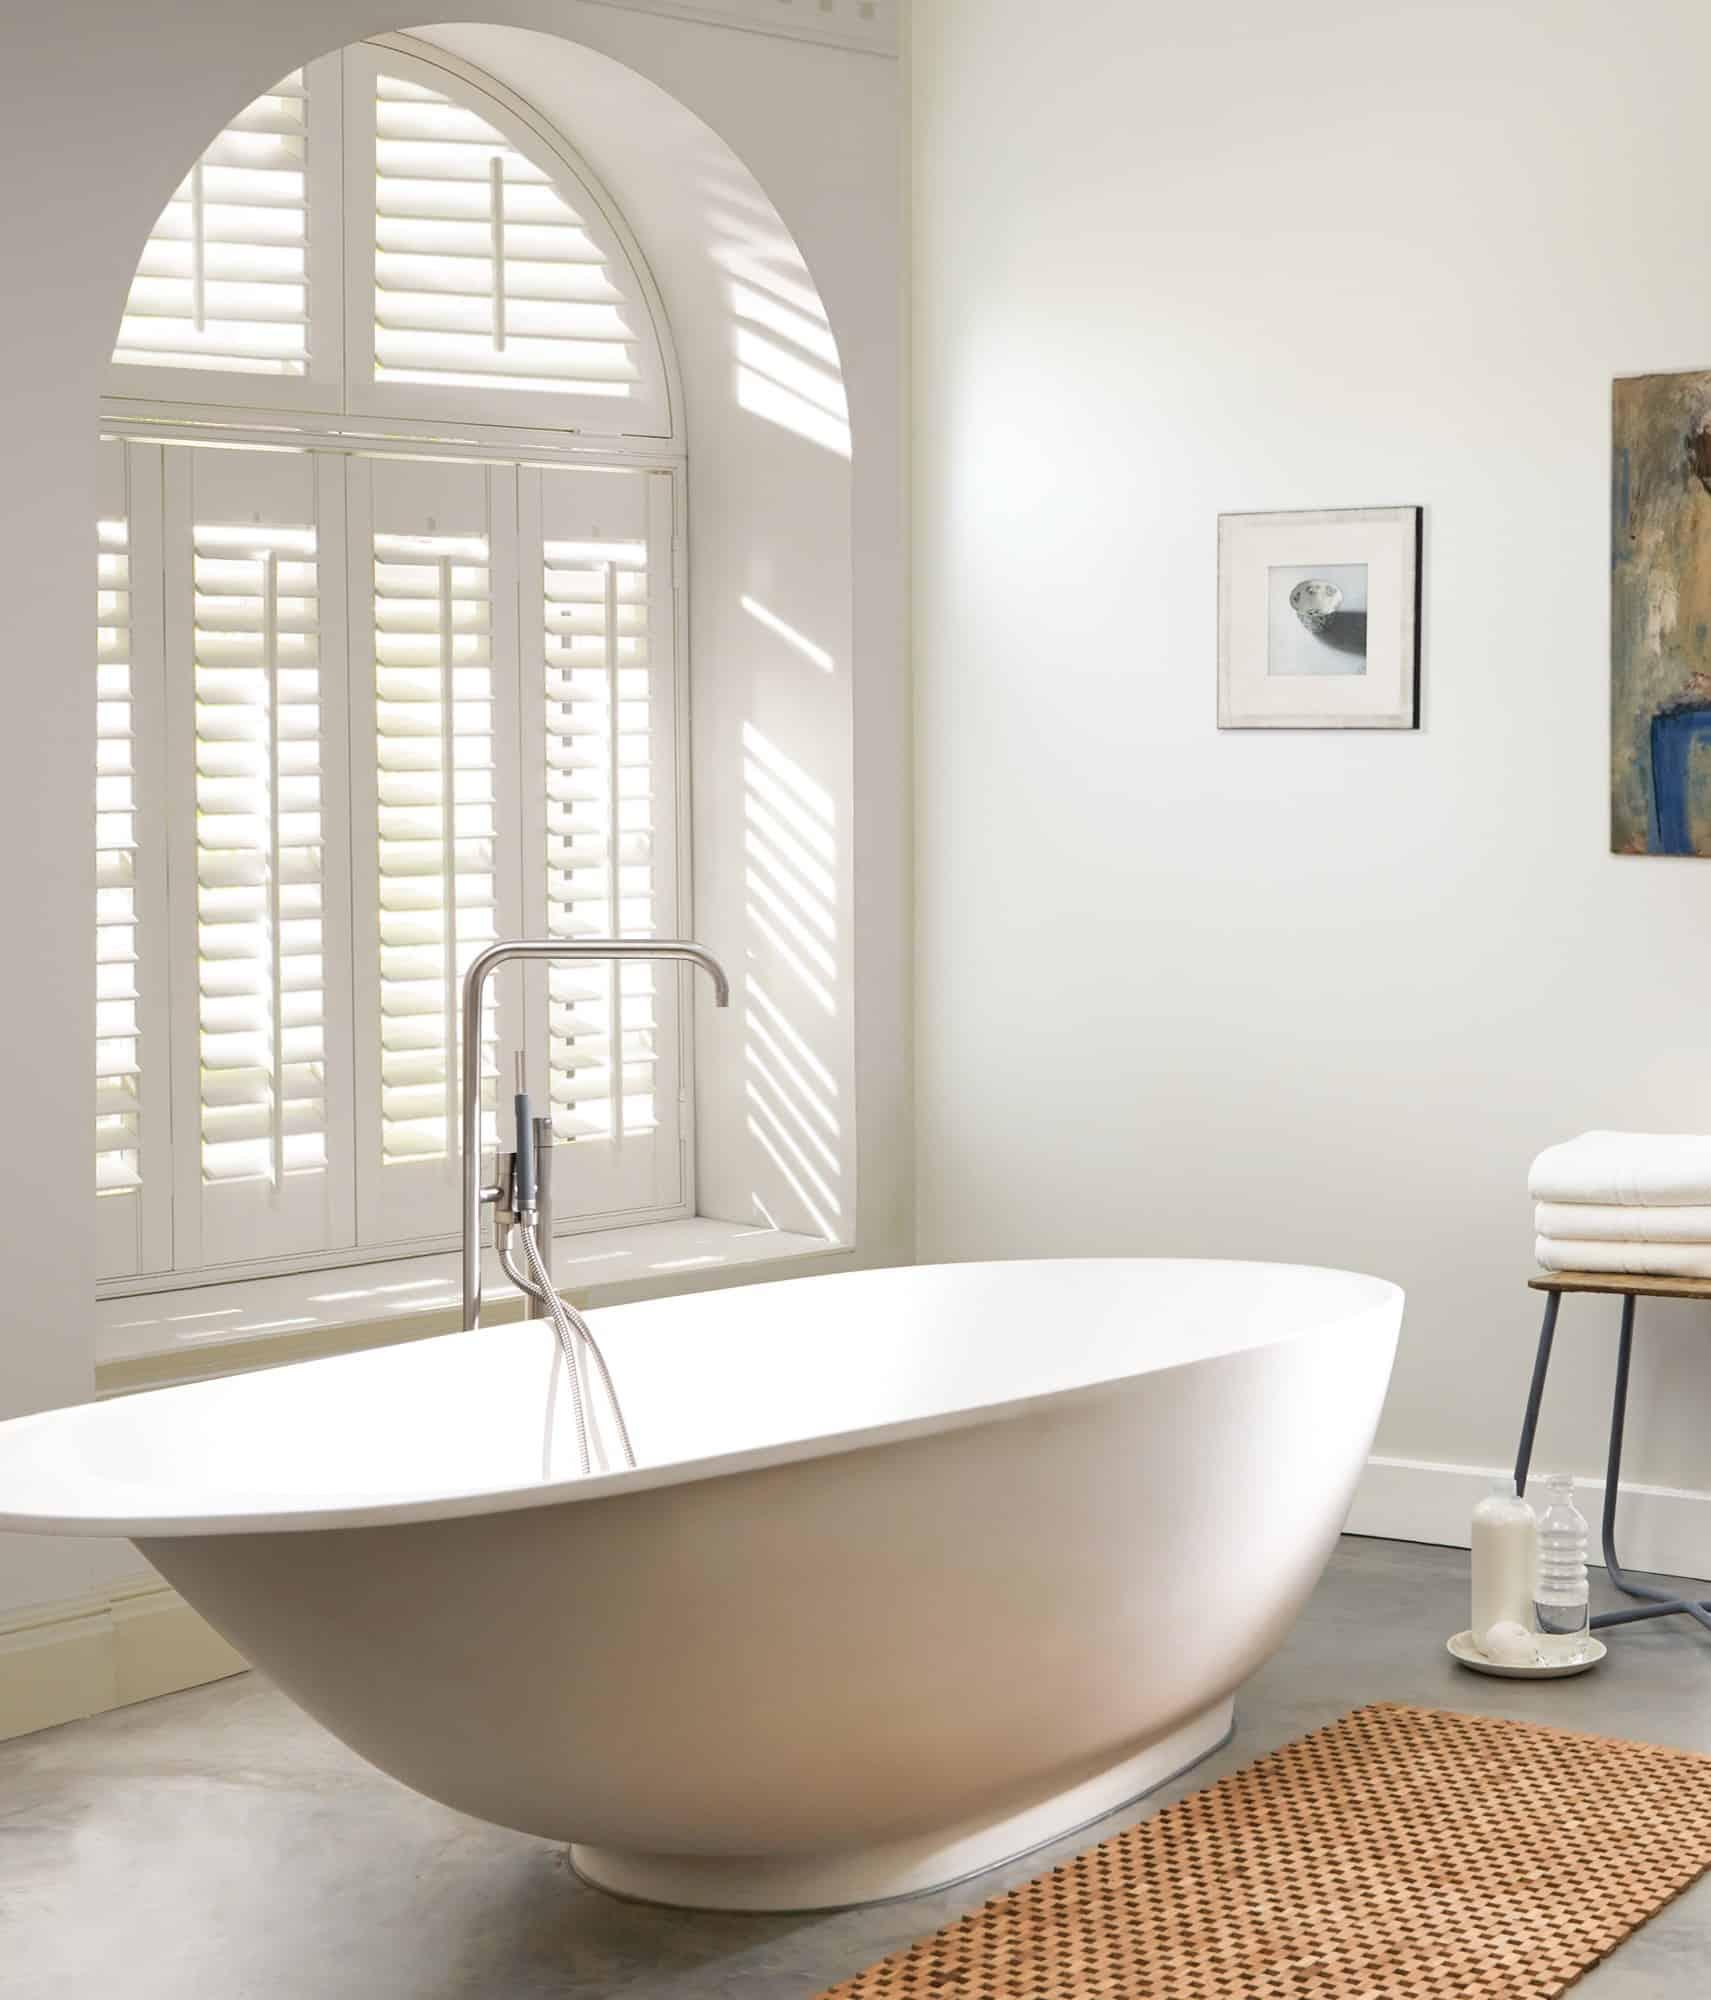 Luxaflex Faux Wood Shutter_bathroom_arch window